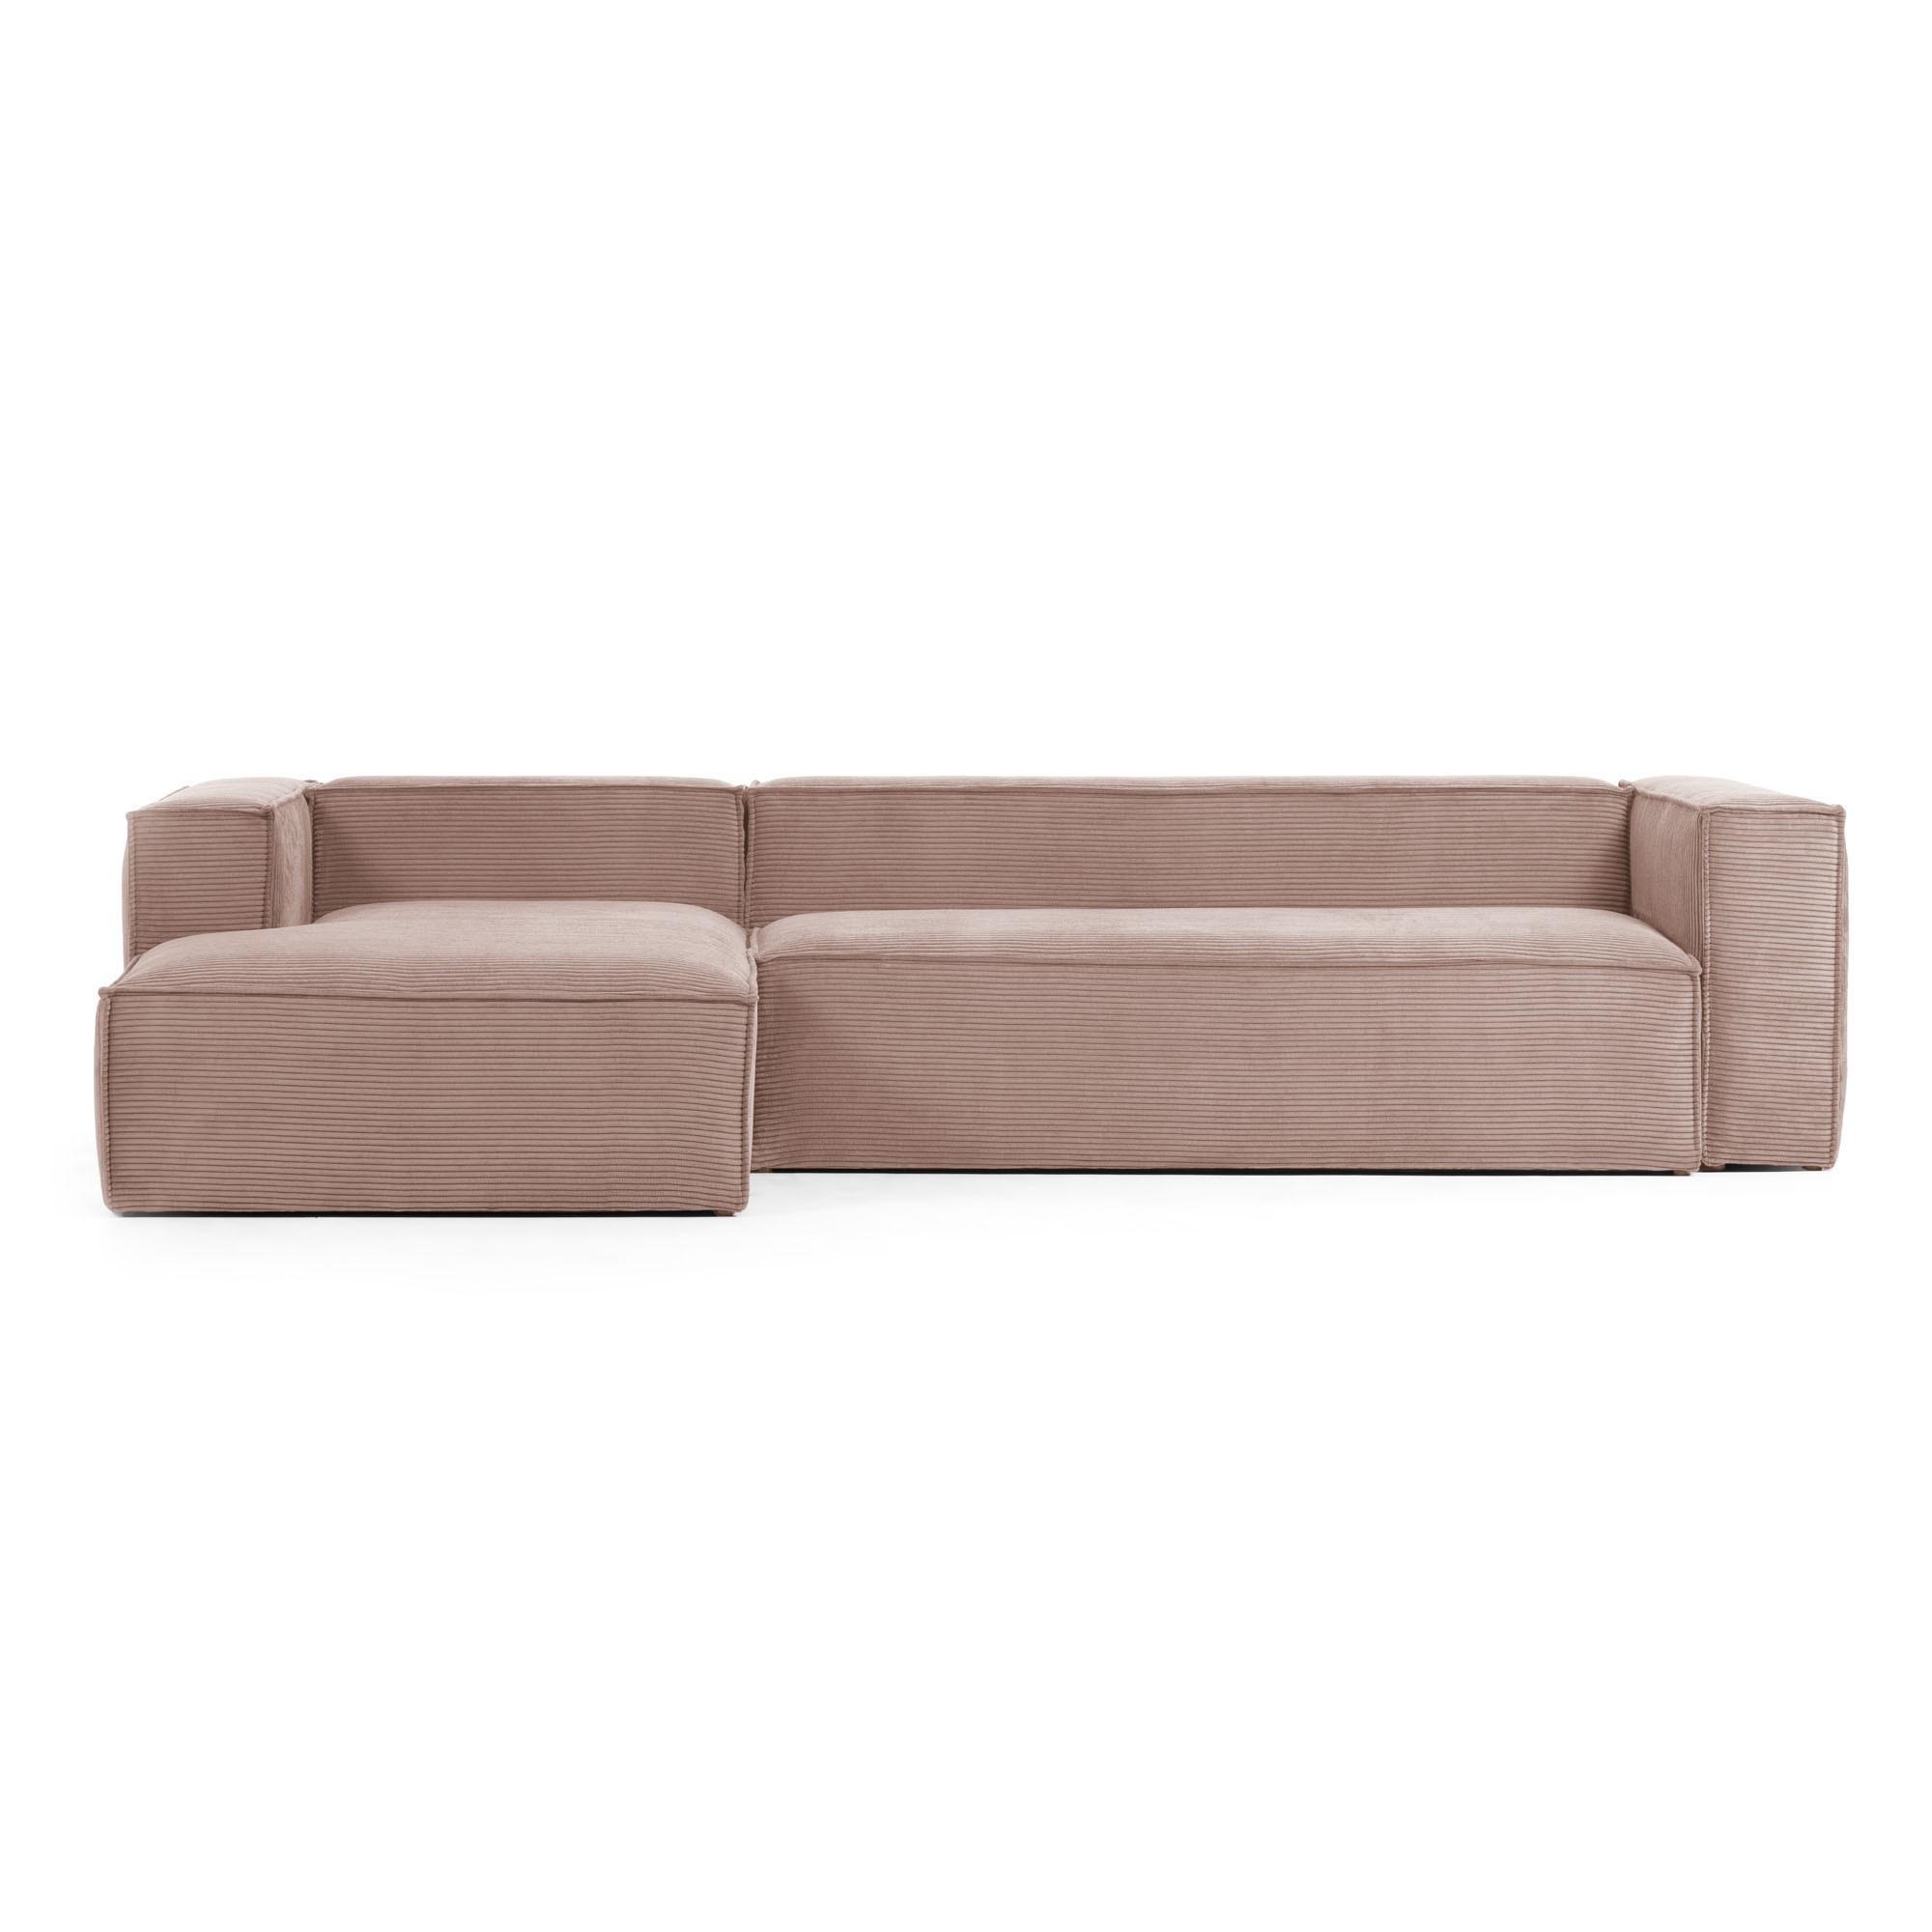 Lorton Corduroy Fabric Corner Sofa, 2 Seater with LHF Chaise, Blush